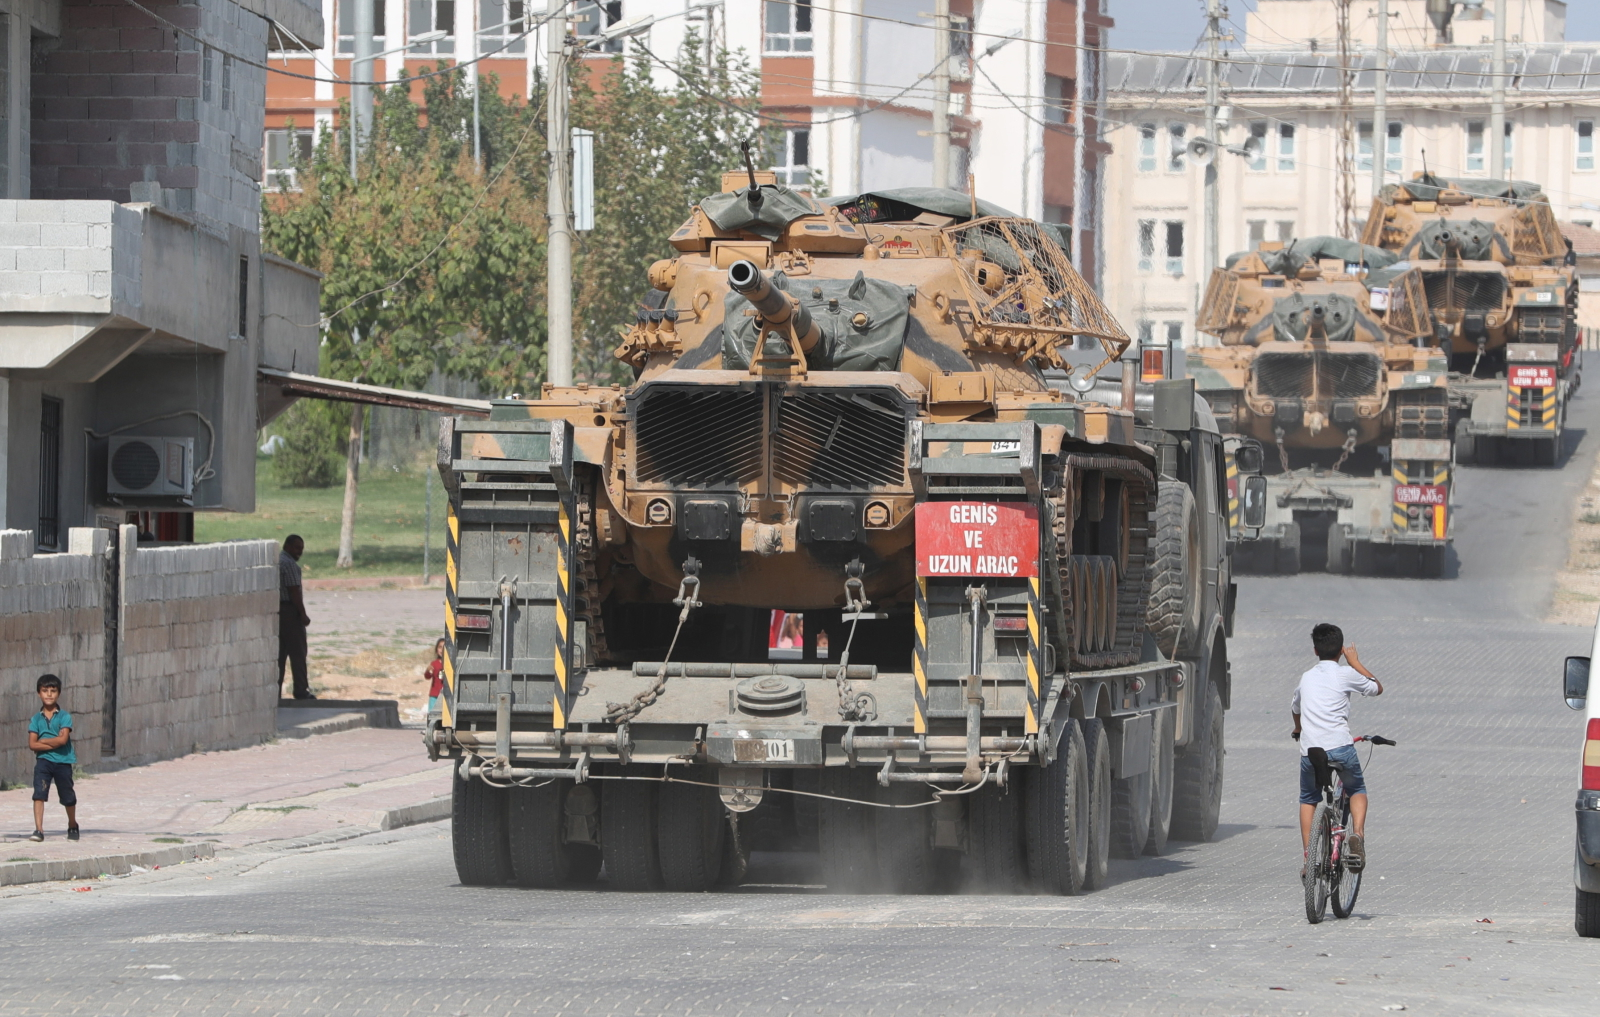 Turecka operacja wojskowa w Syrii EPA/SEDAT SUNA